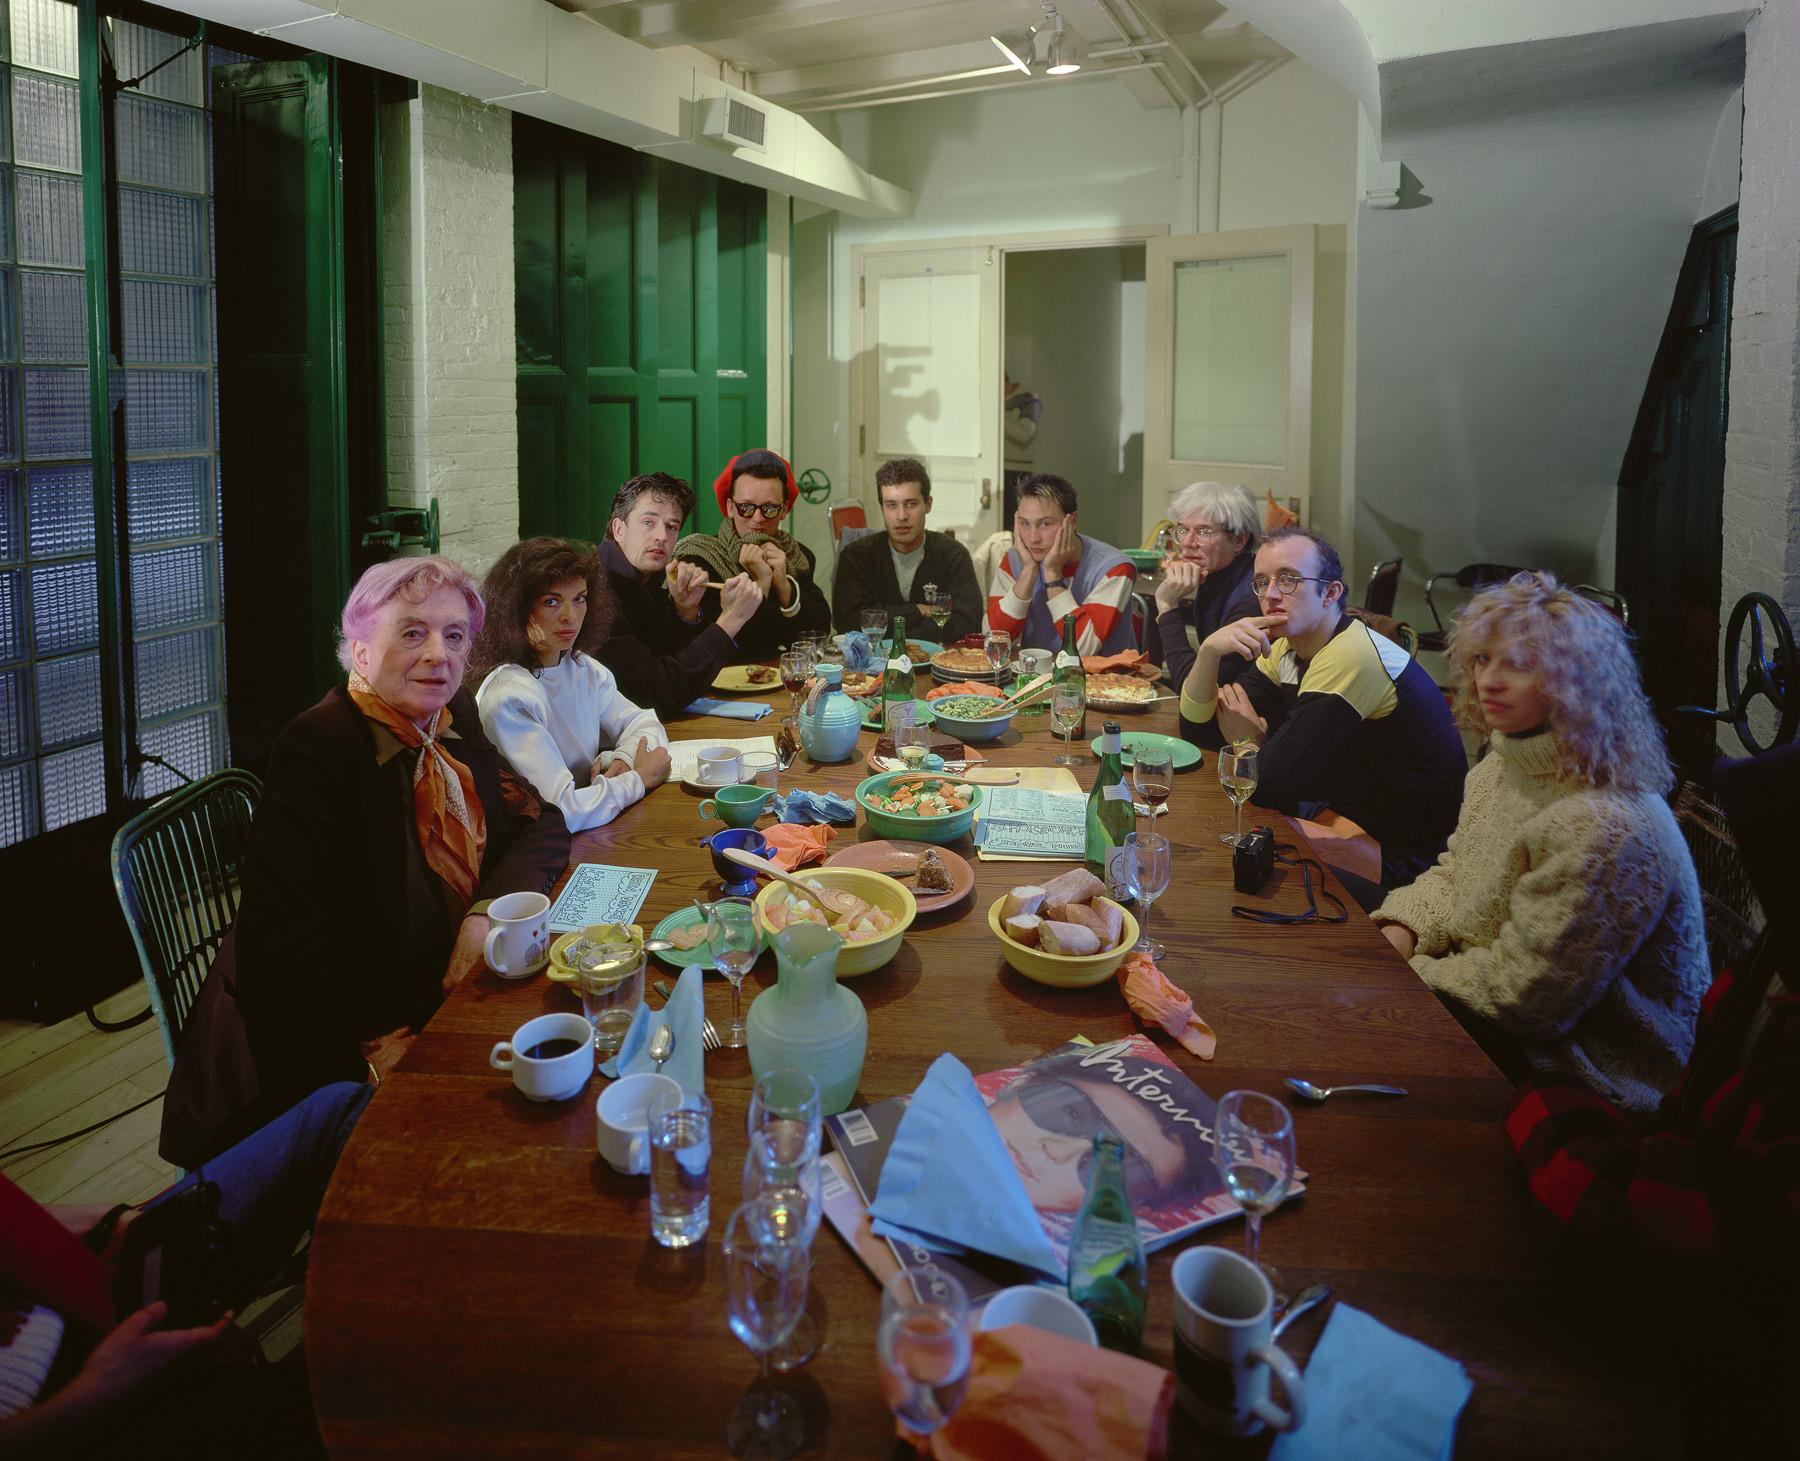 Andy Warhol Studio